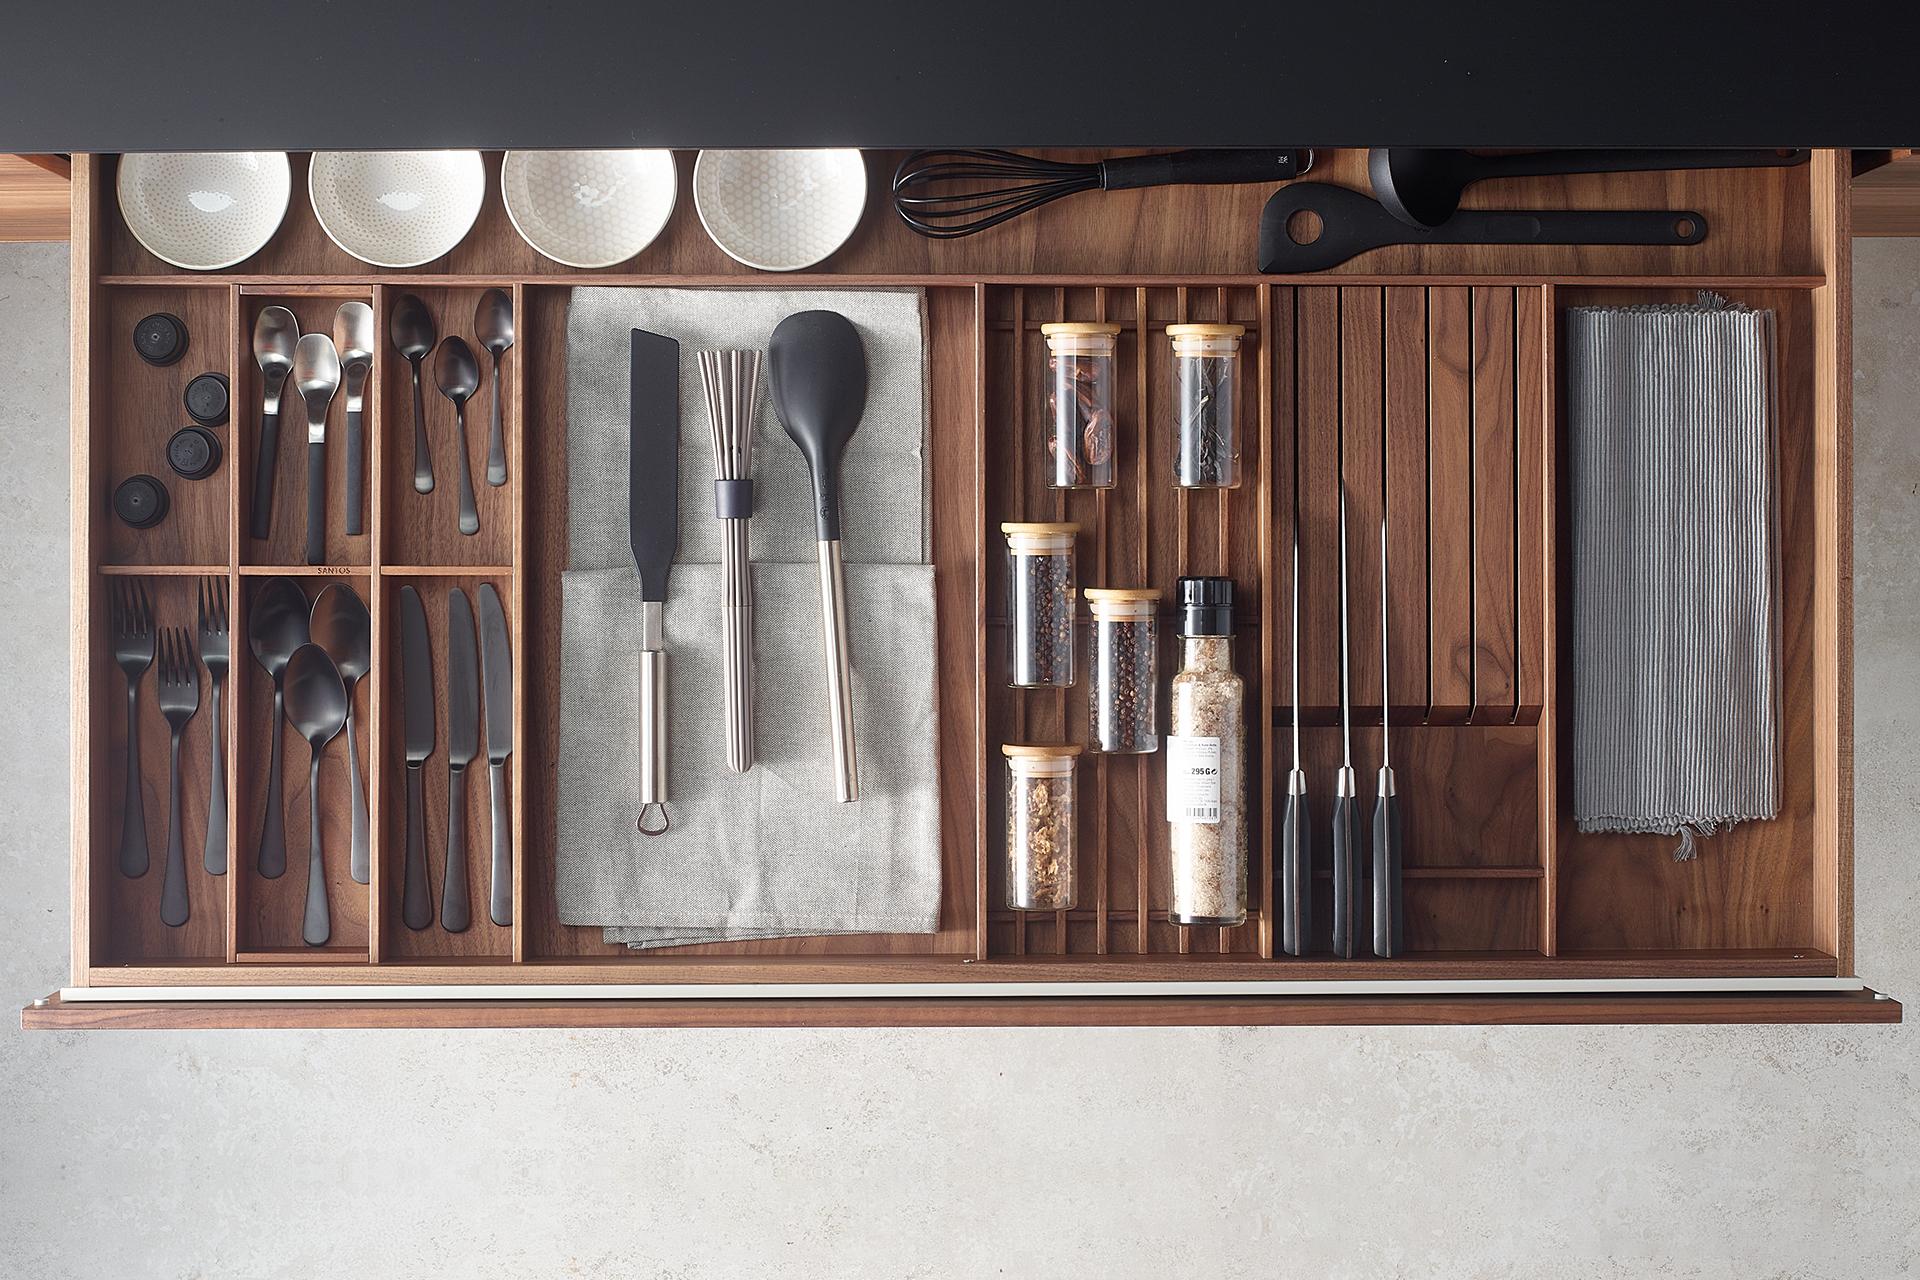 Accessories for drawer interiors in Santos kitchen